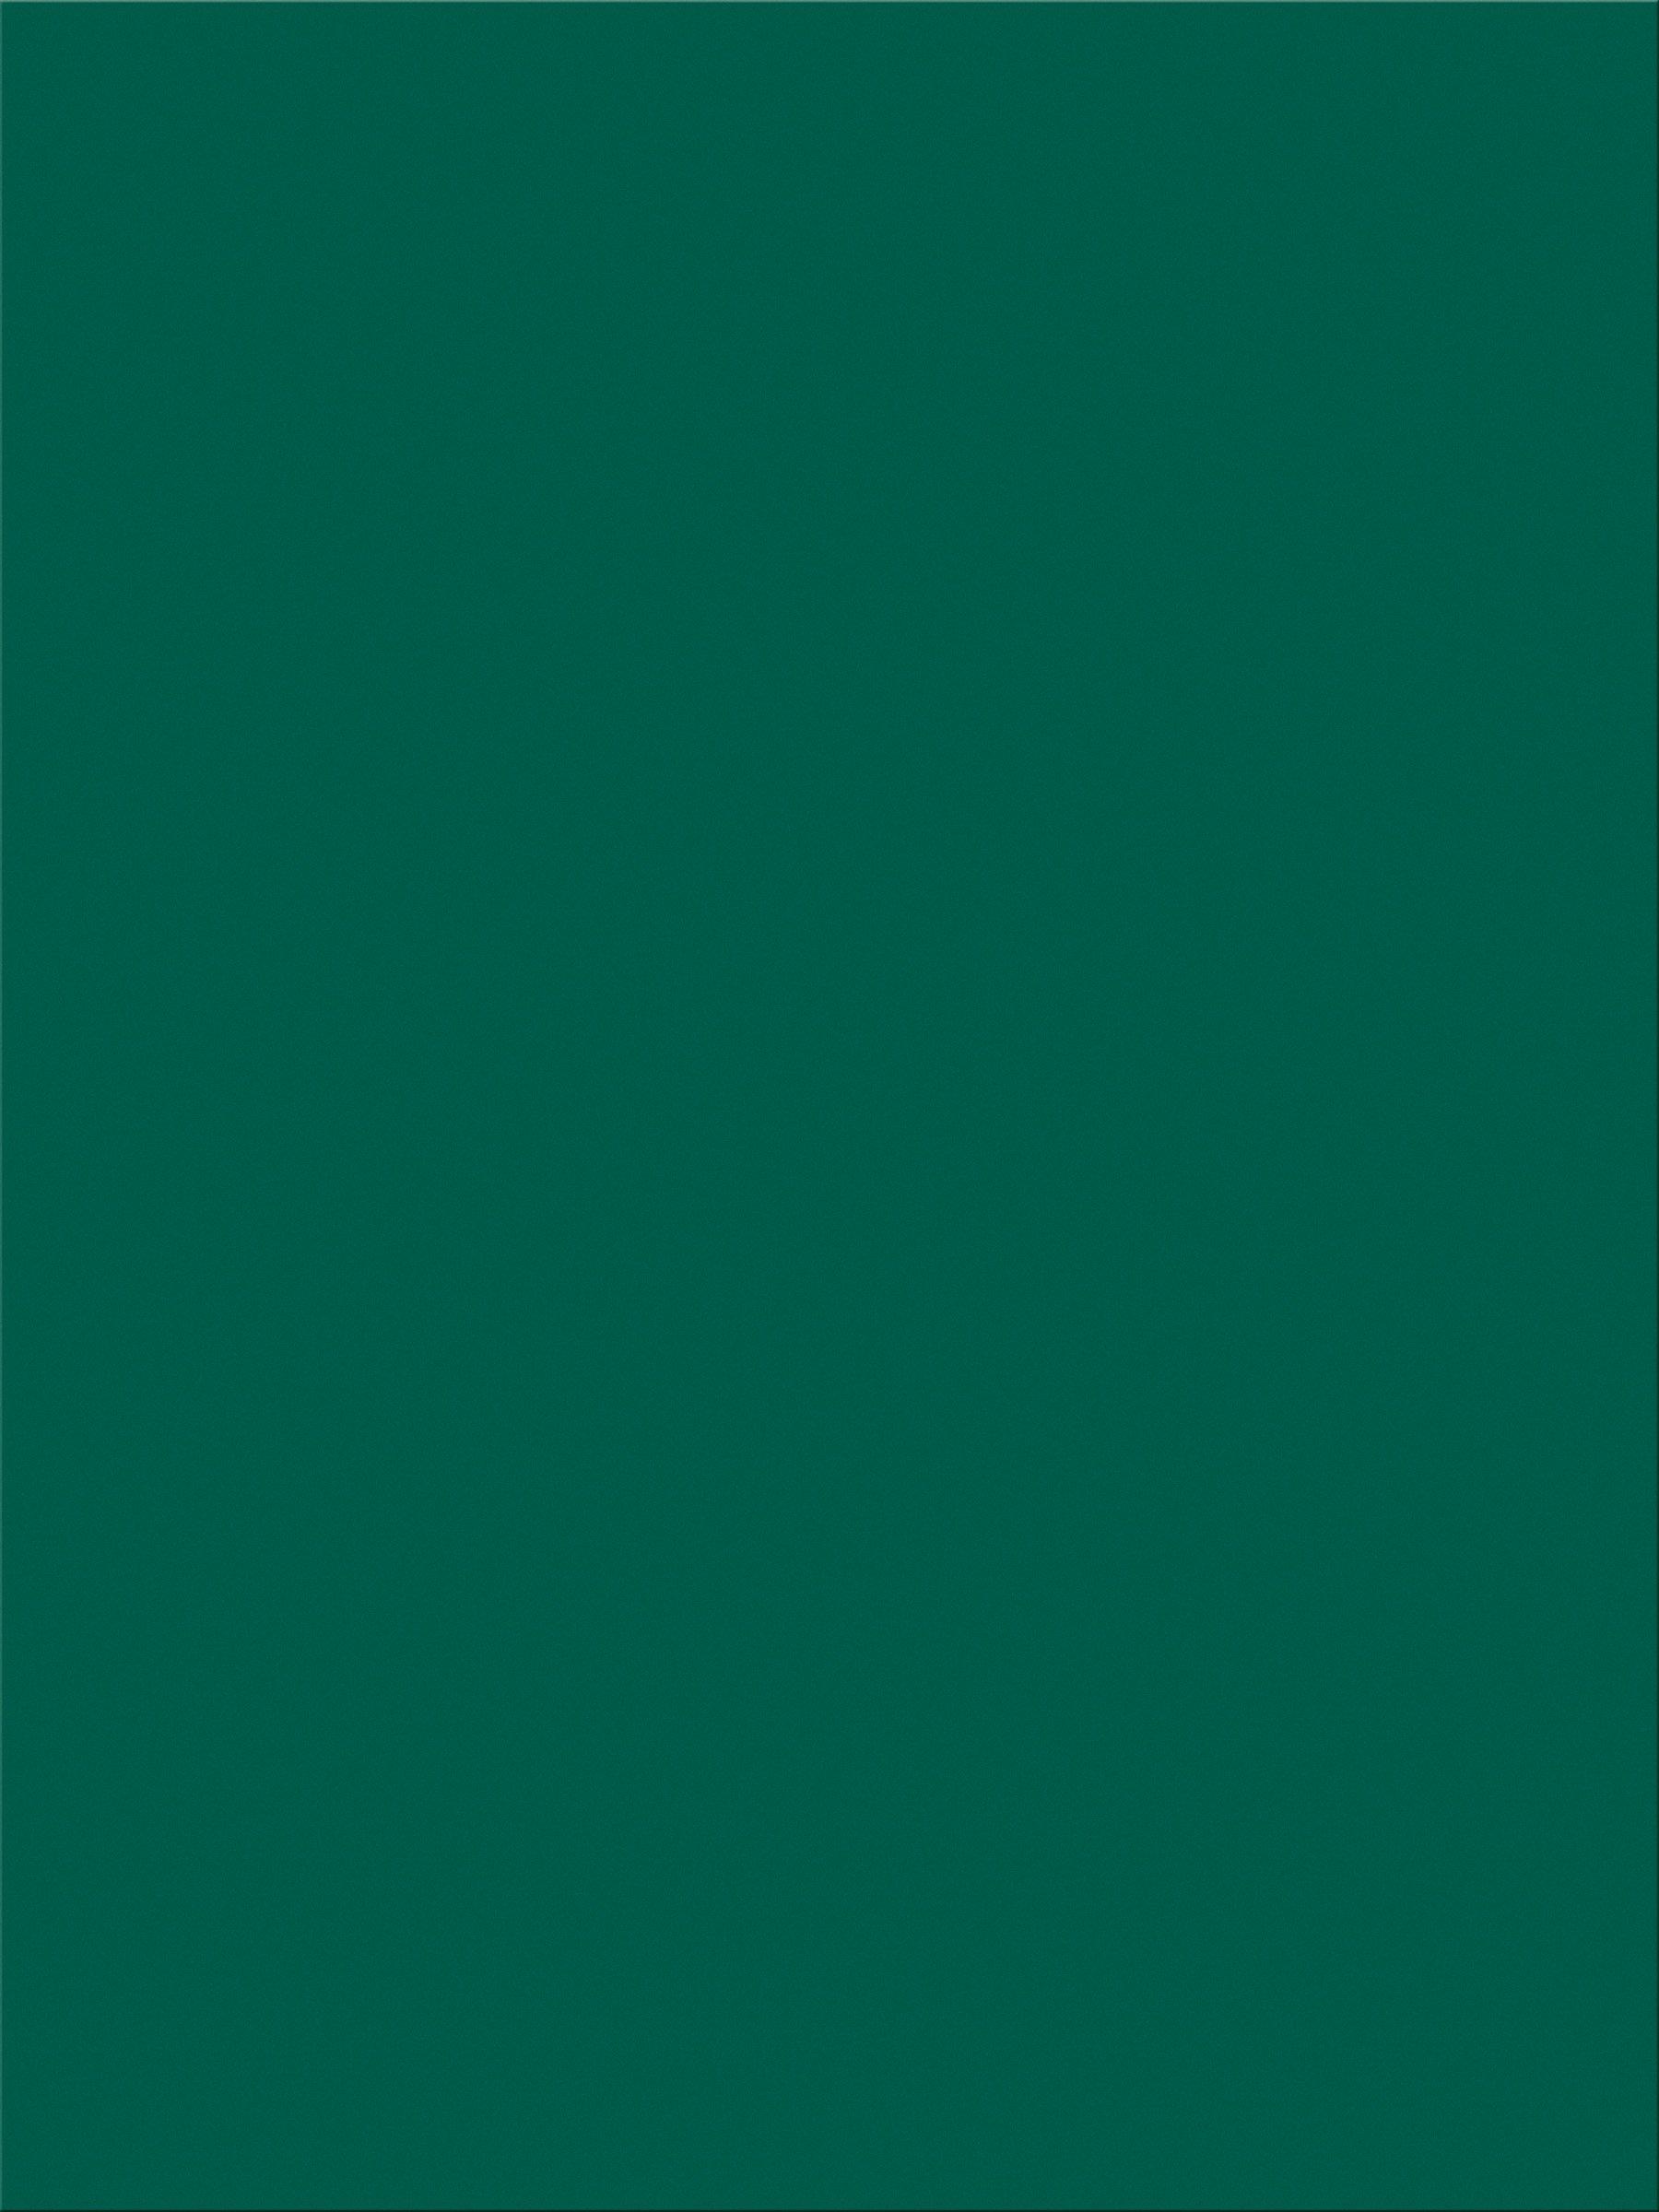 Pacon SunWorks Construction Paper, 9'' x 12'', 100-Count, Dark Green (7804)